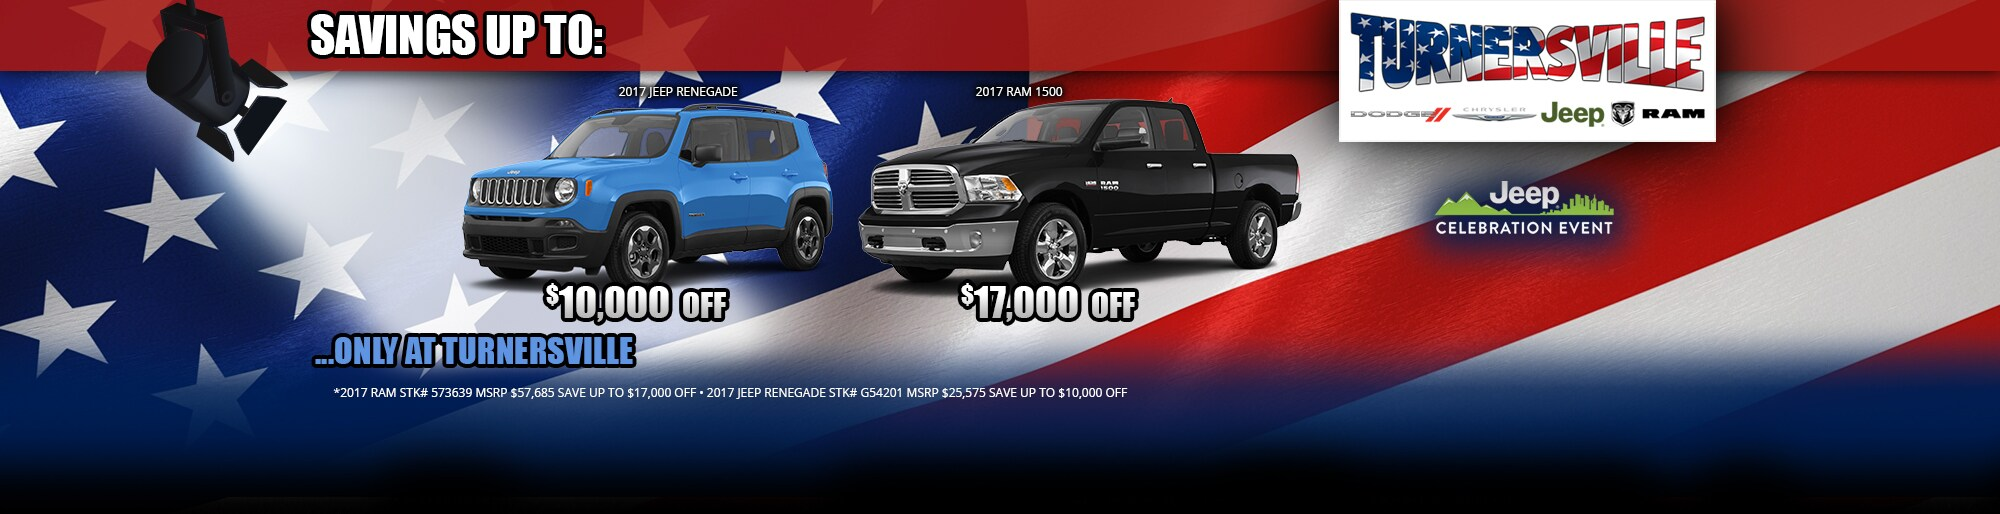 Hyundai Of Turnersville >> Turnersville Jeep Chrysler Dodge RAM Dealership in South ...